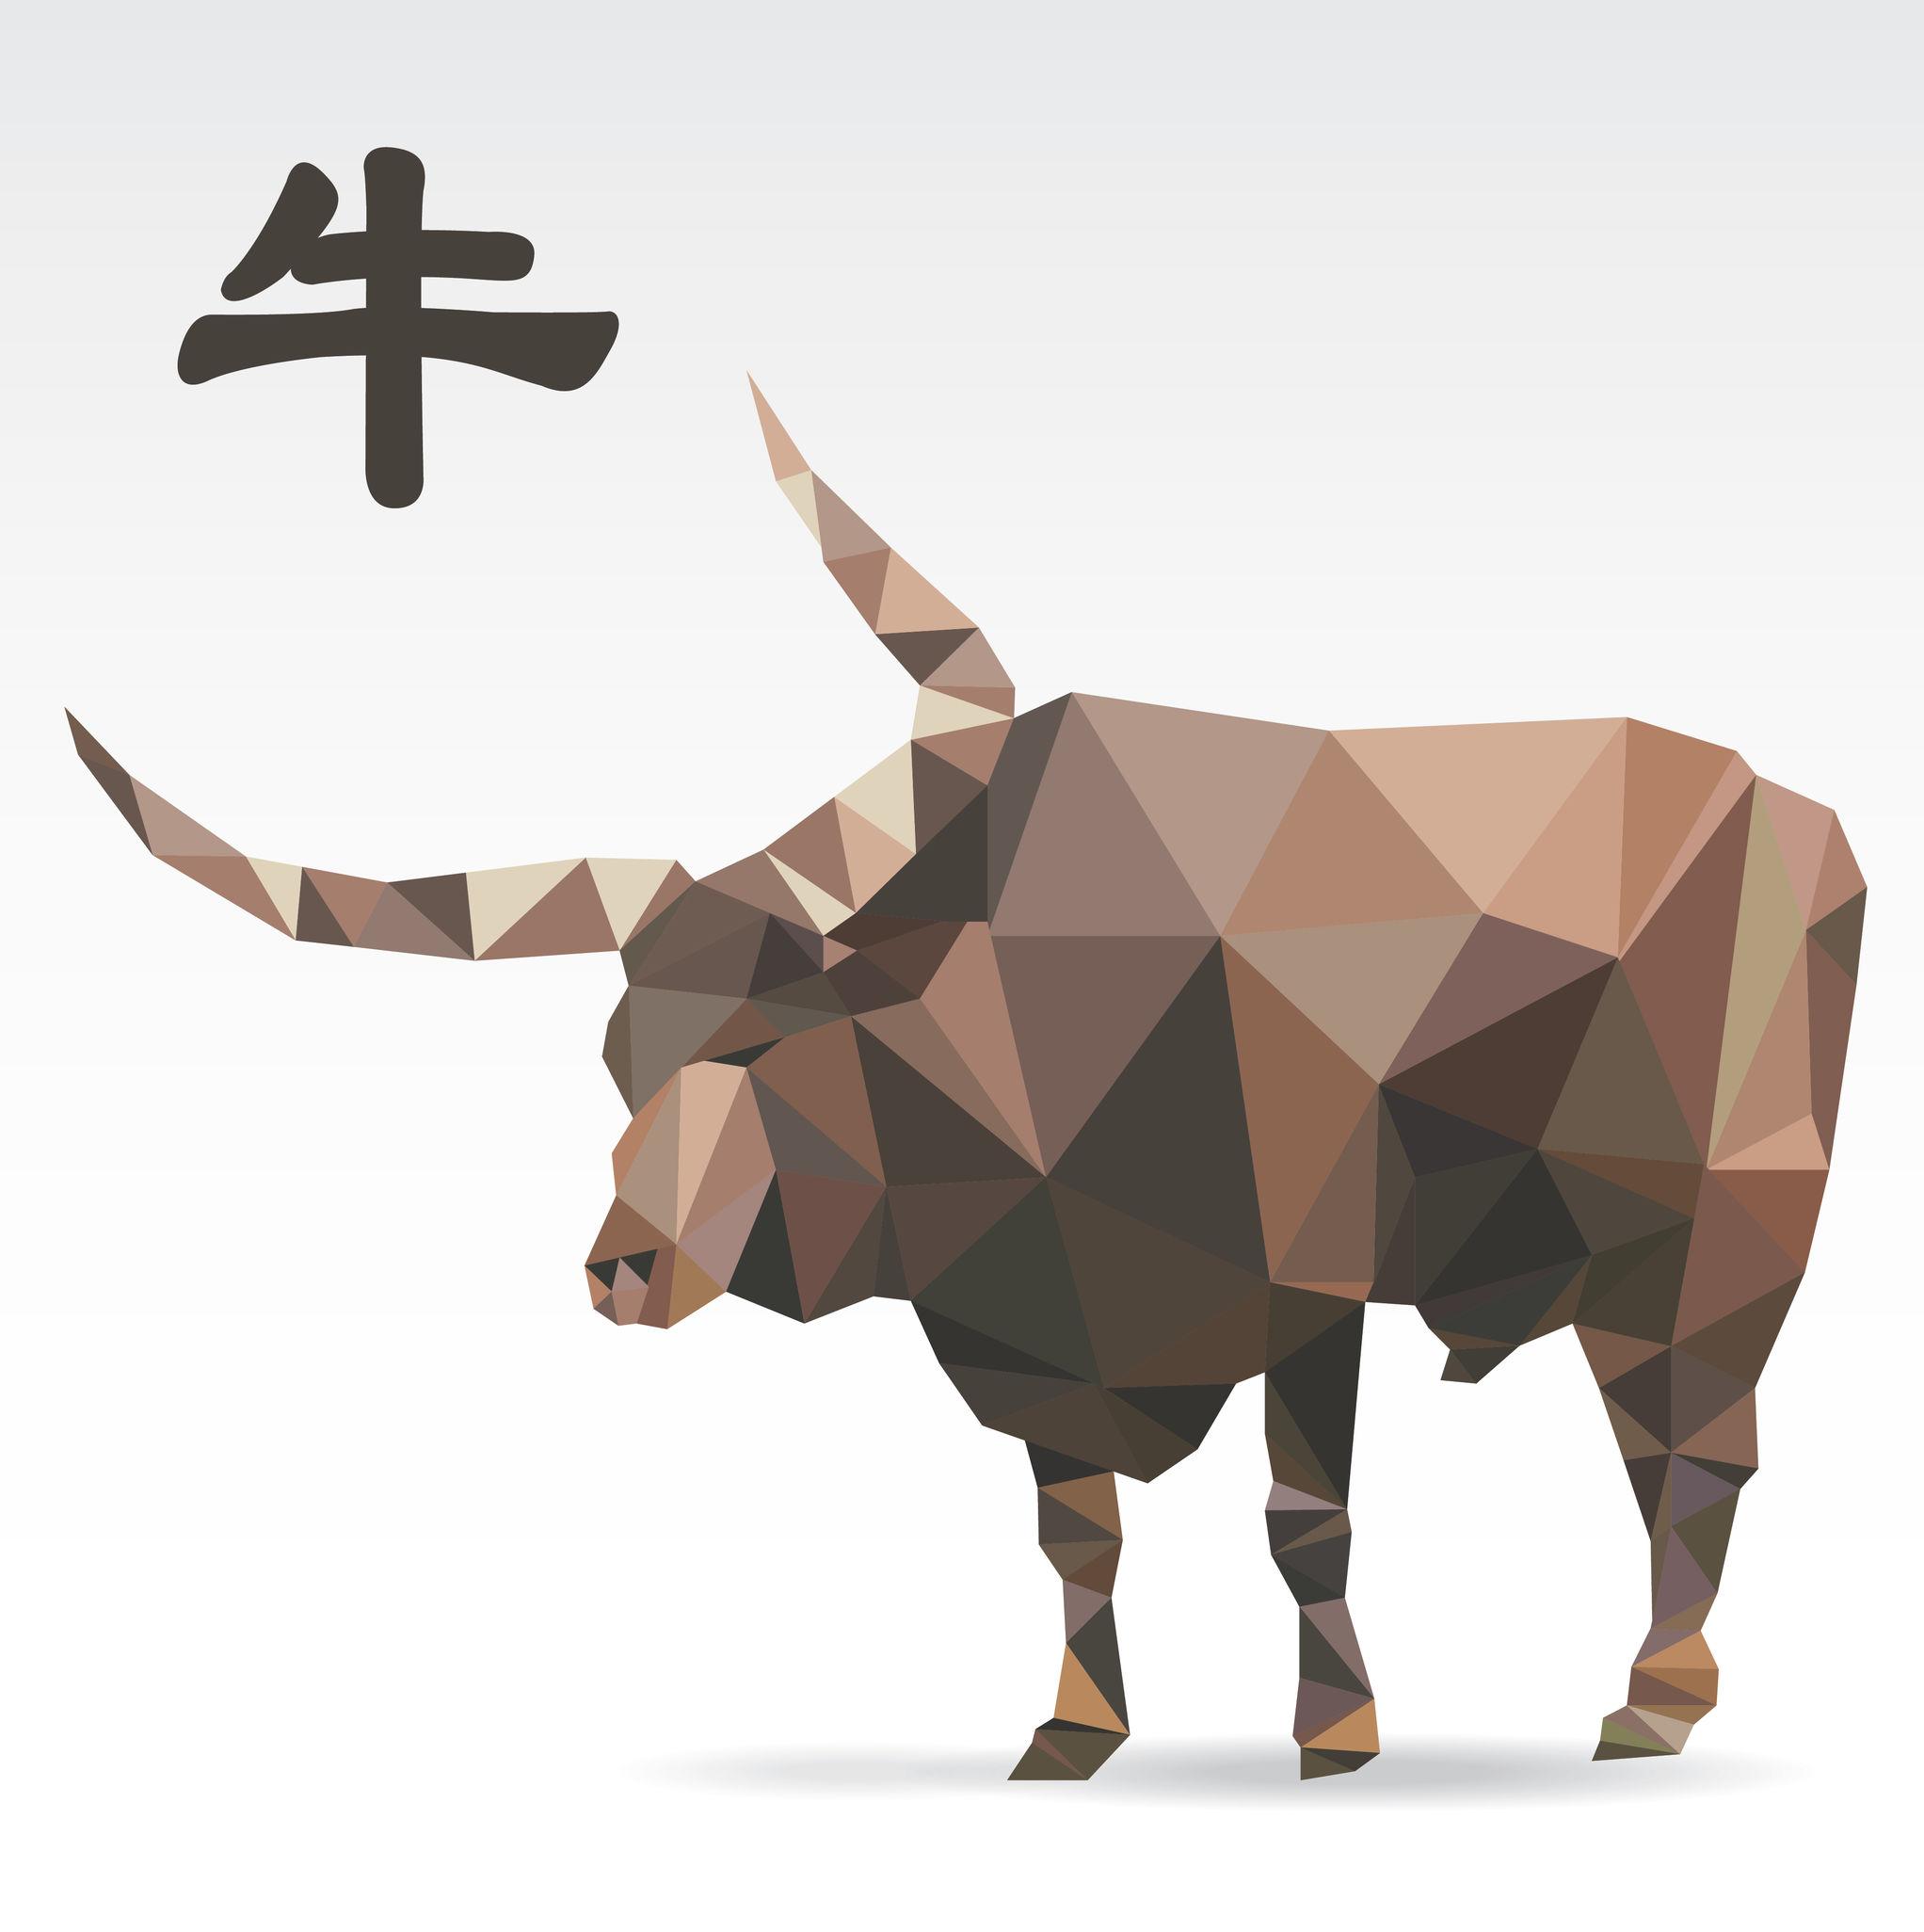 chinese horoscope 2020 prediction ox